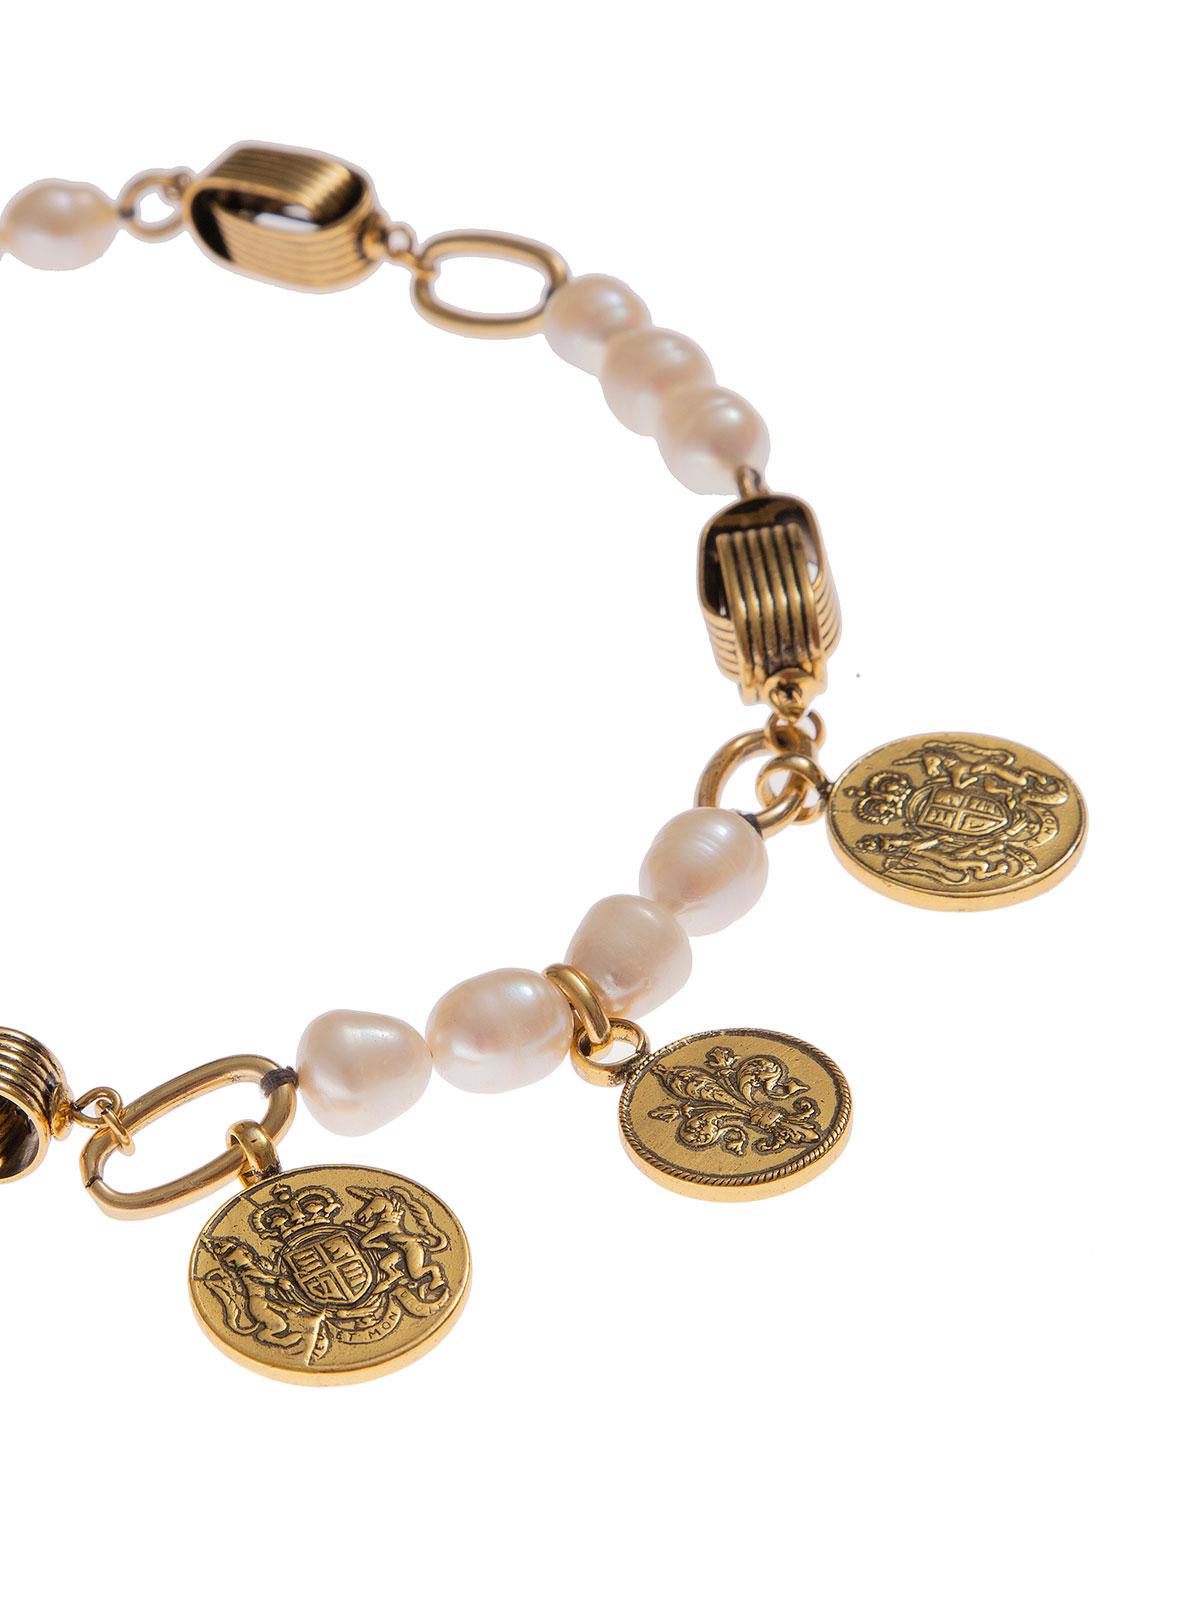 Collana con monete e perle